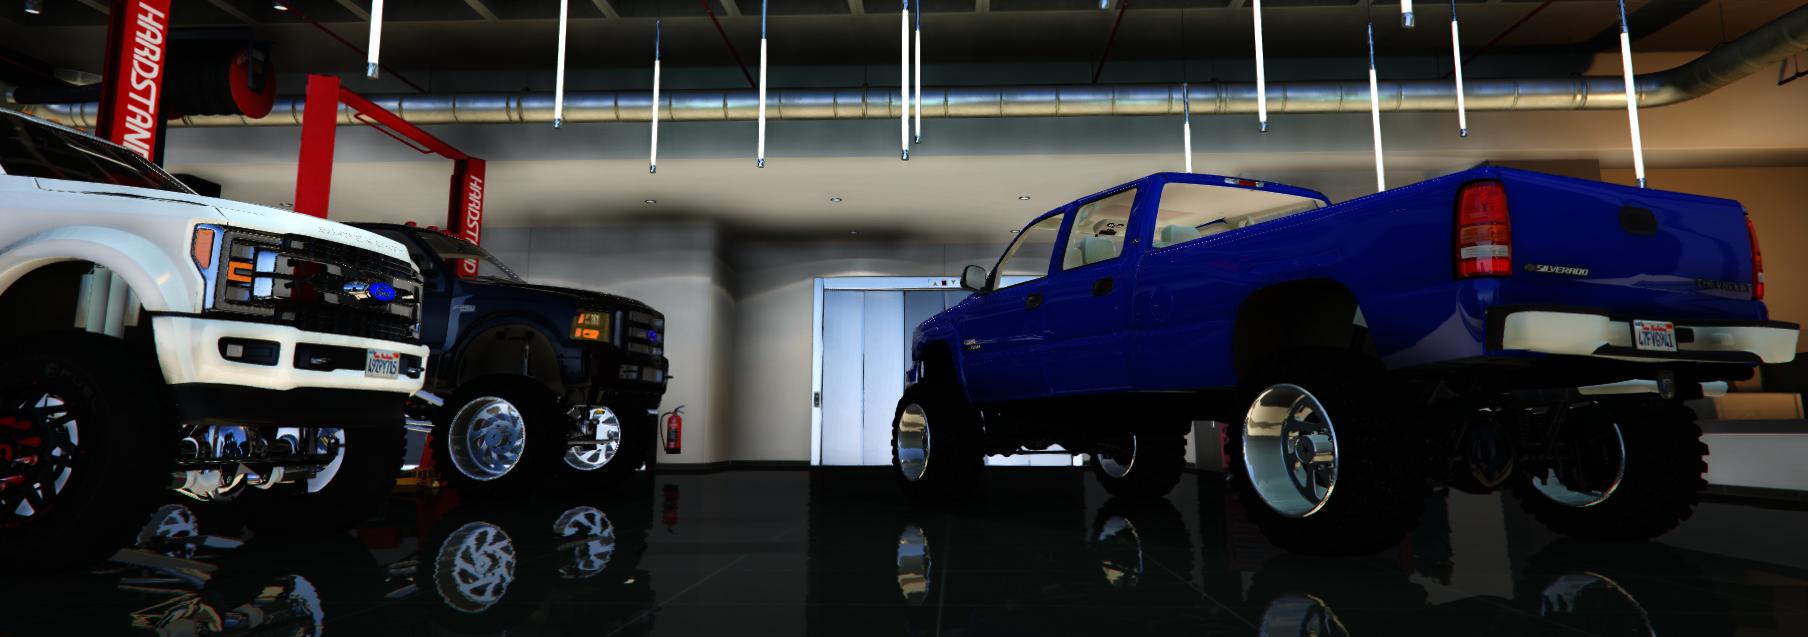 2001 Chevrolet Silverado 3500 Duramax Diesel